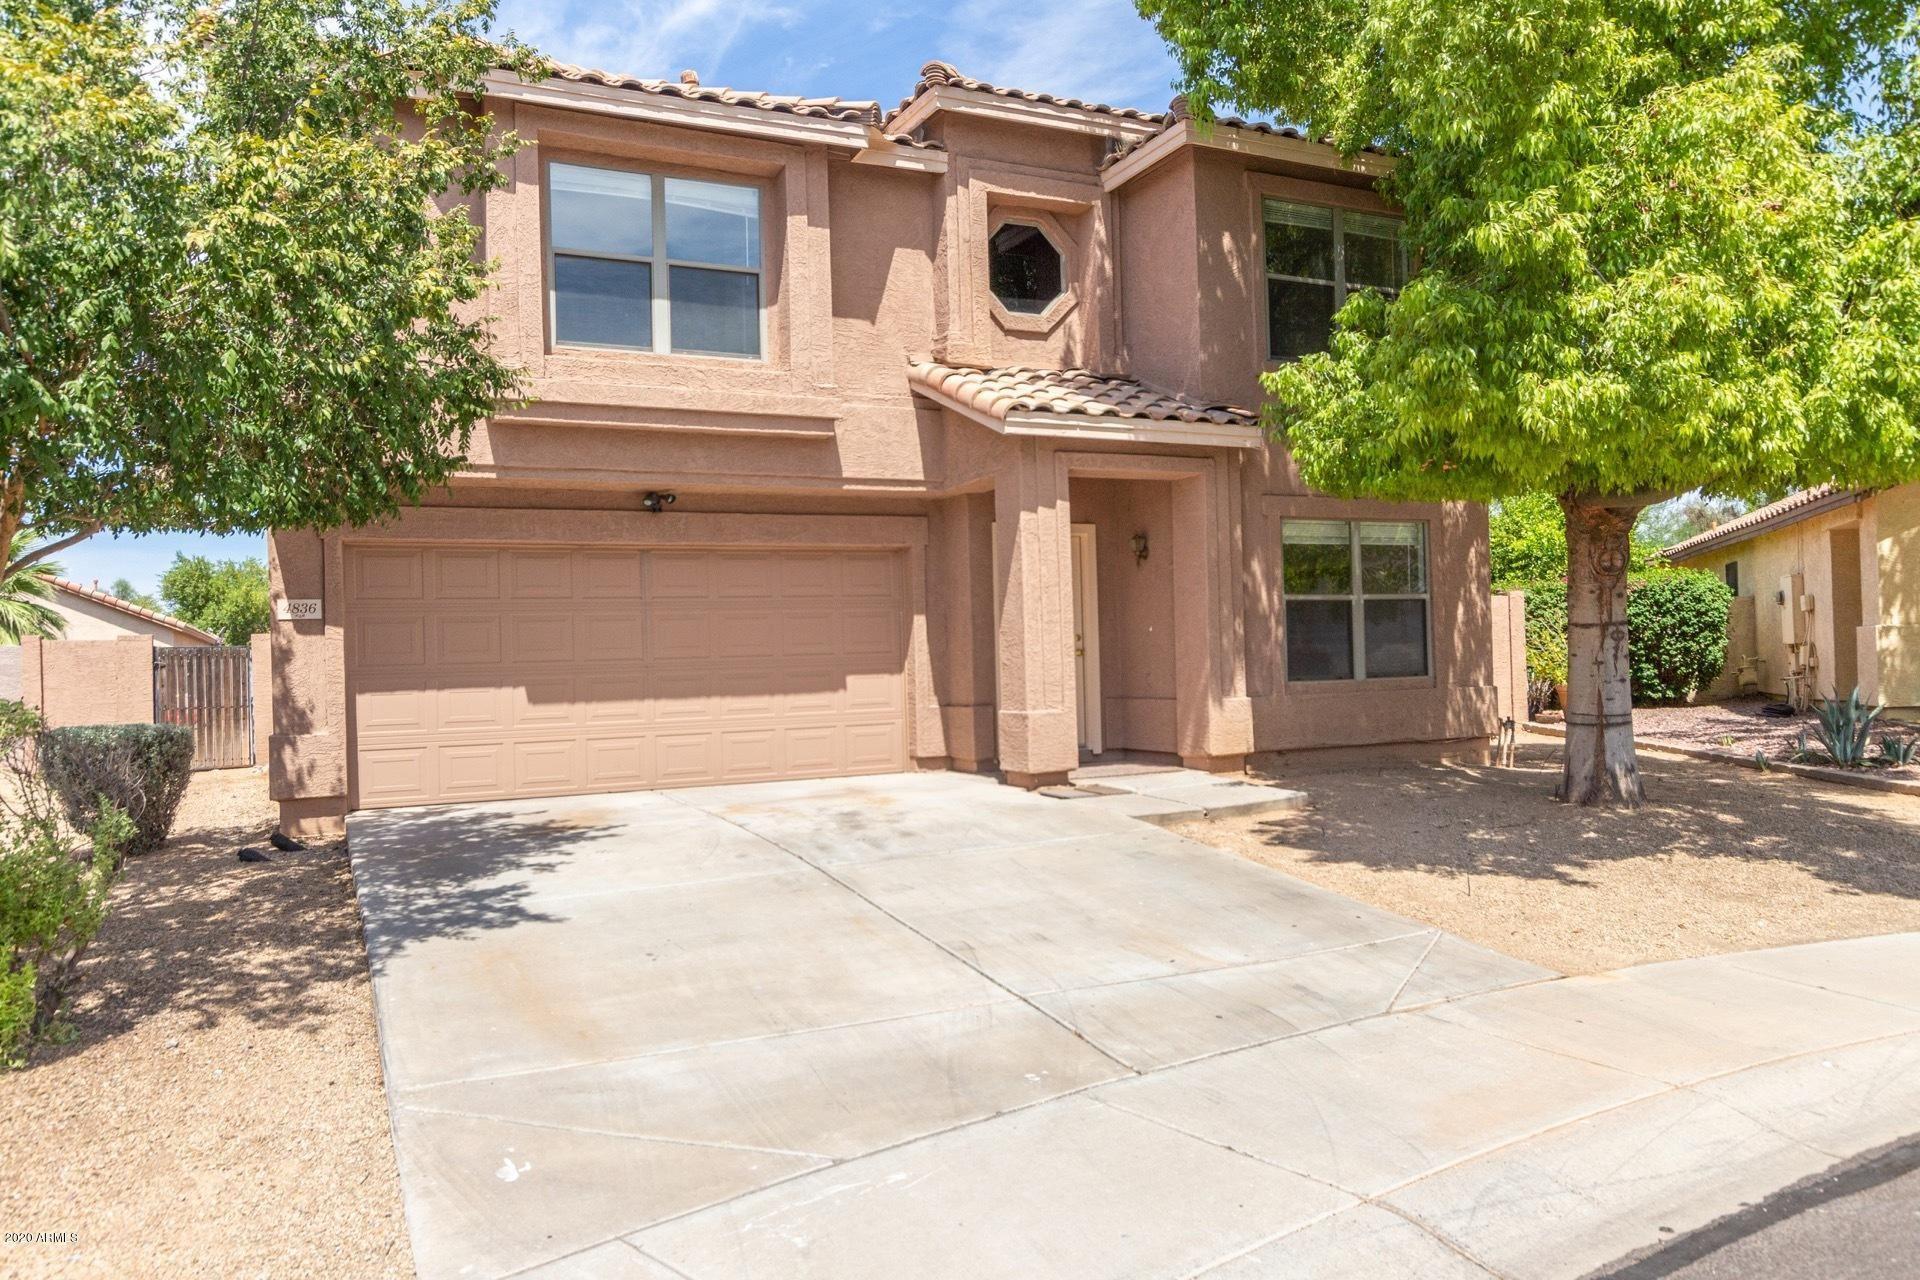 4836 N 92ND Drive, Phoenix, AZ 85037 - MLS#: 6102170